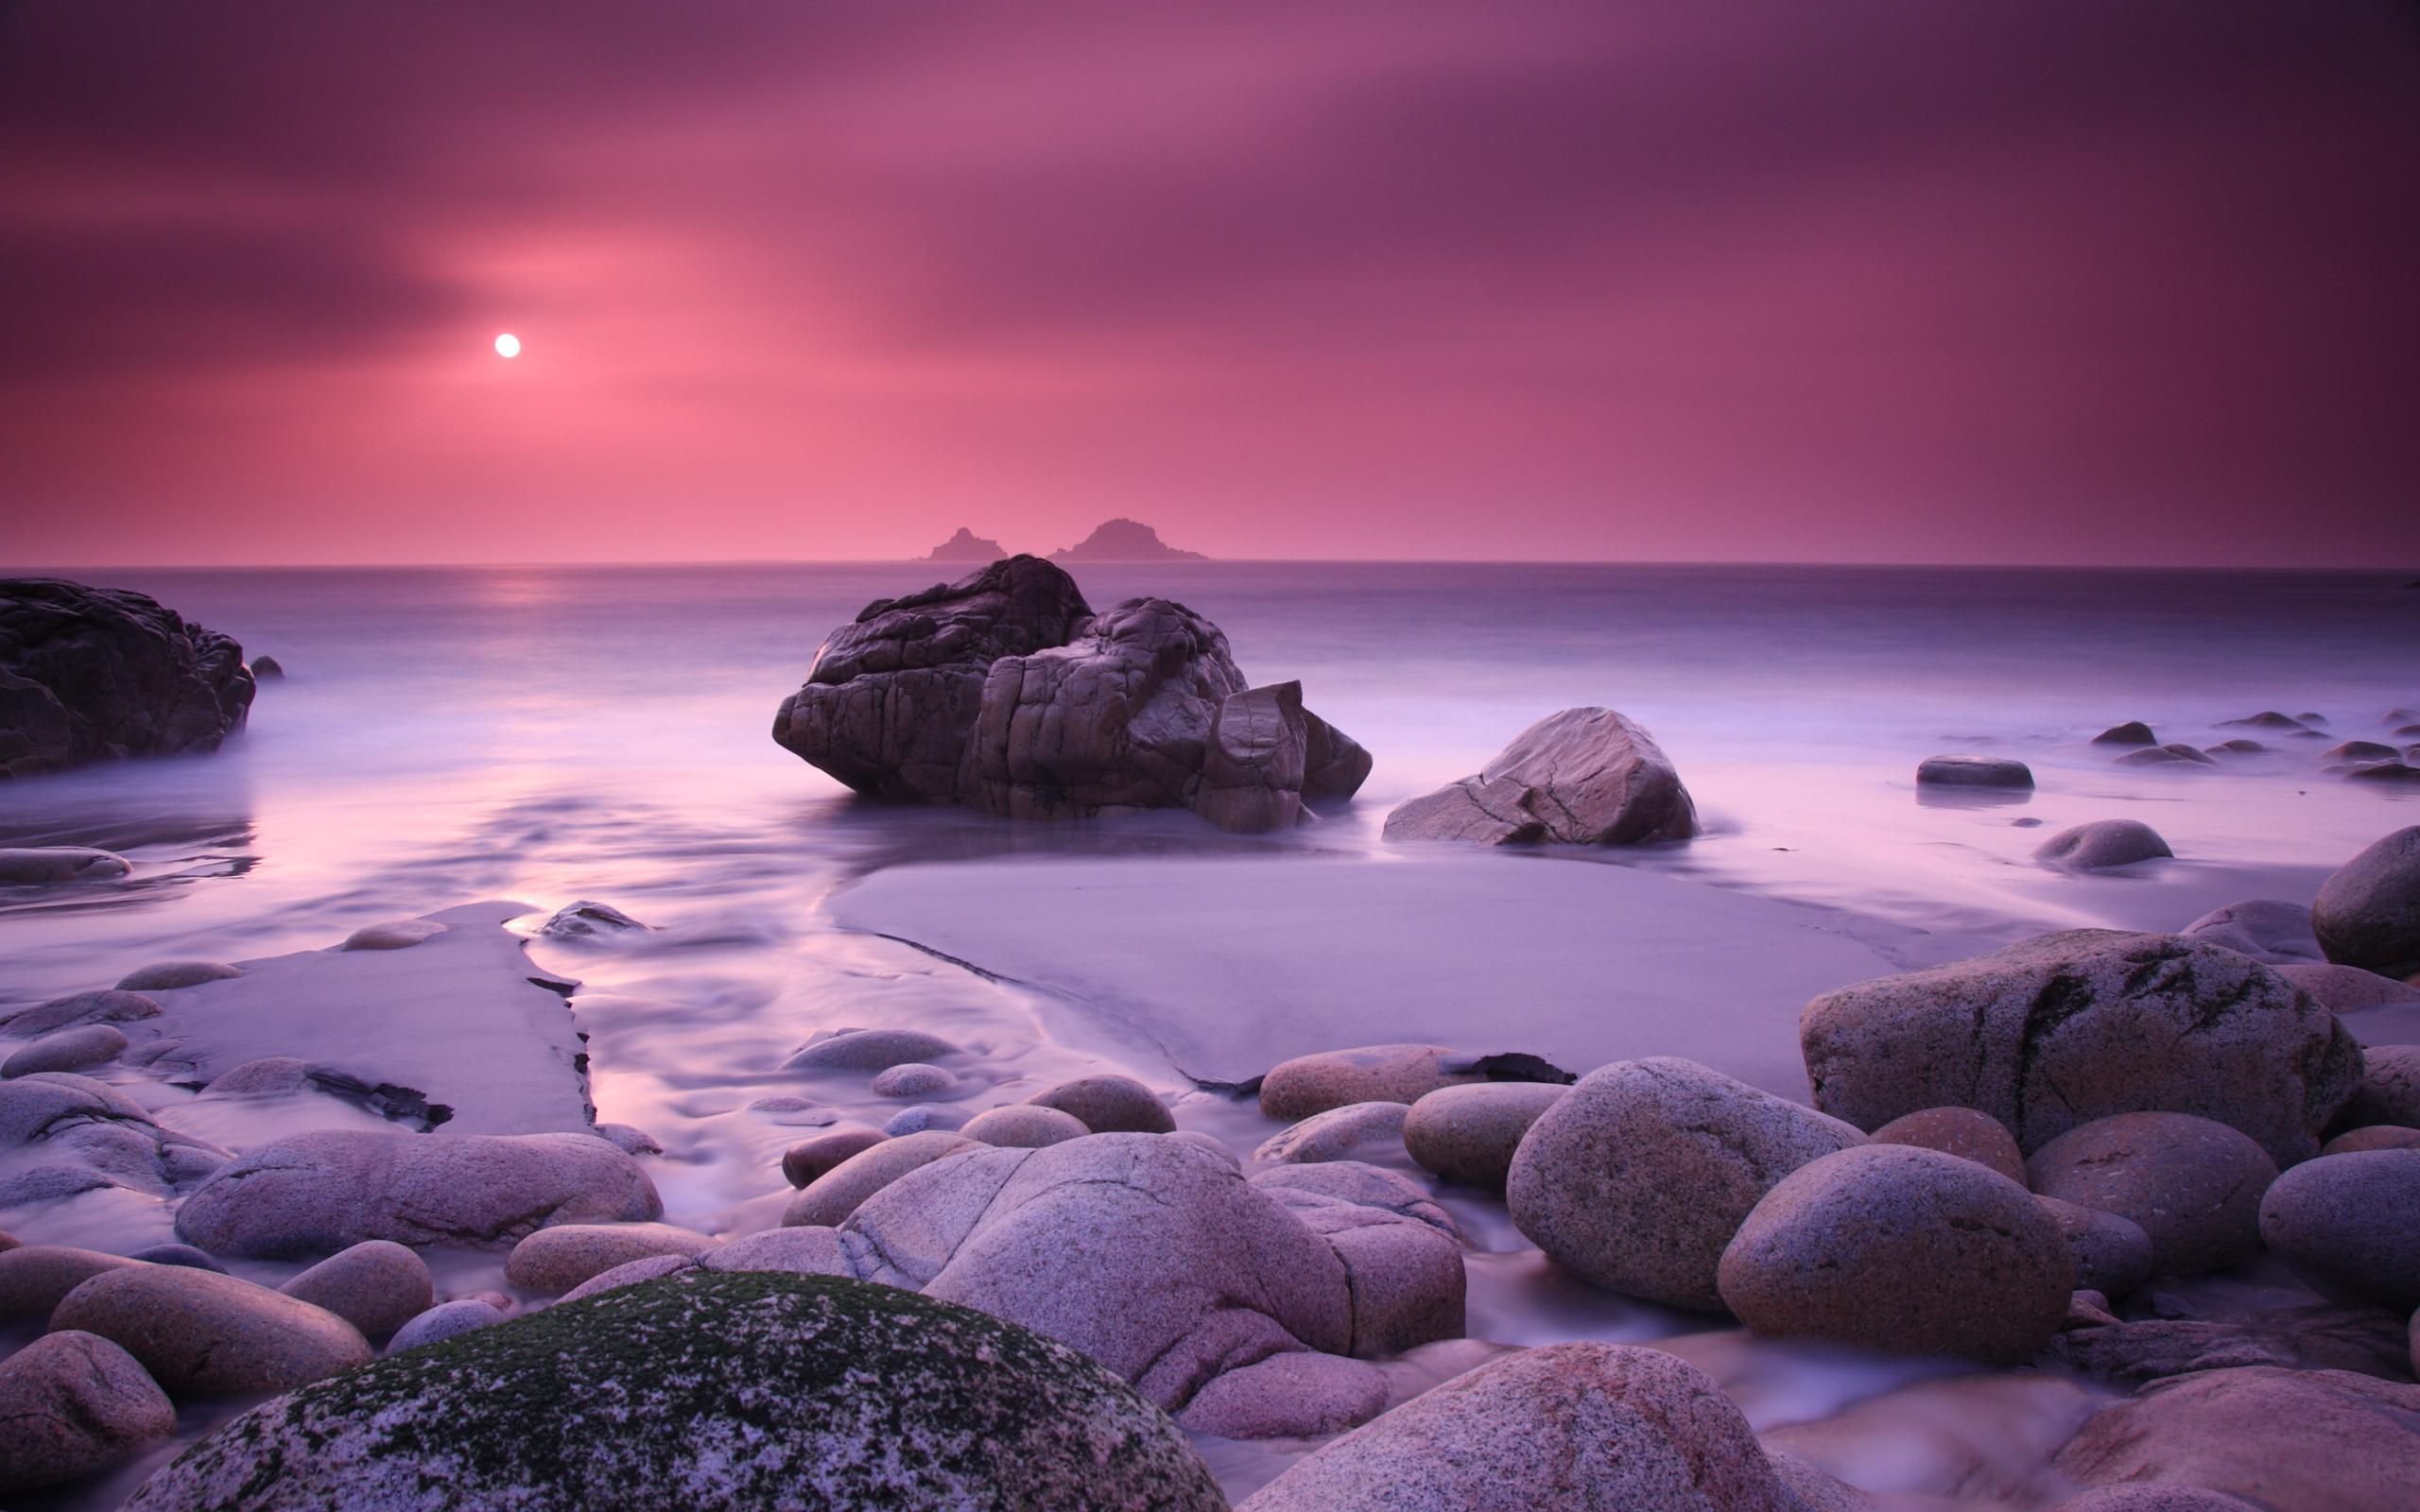 закат камень берег море sunset stone shore sea  № 1023721  скачать